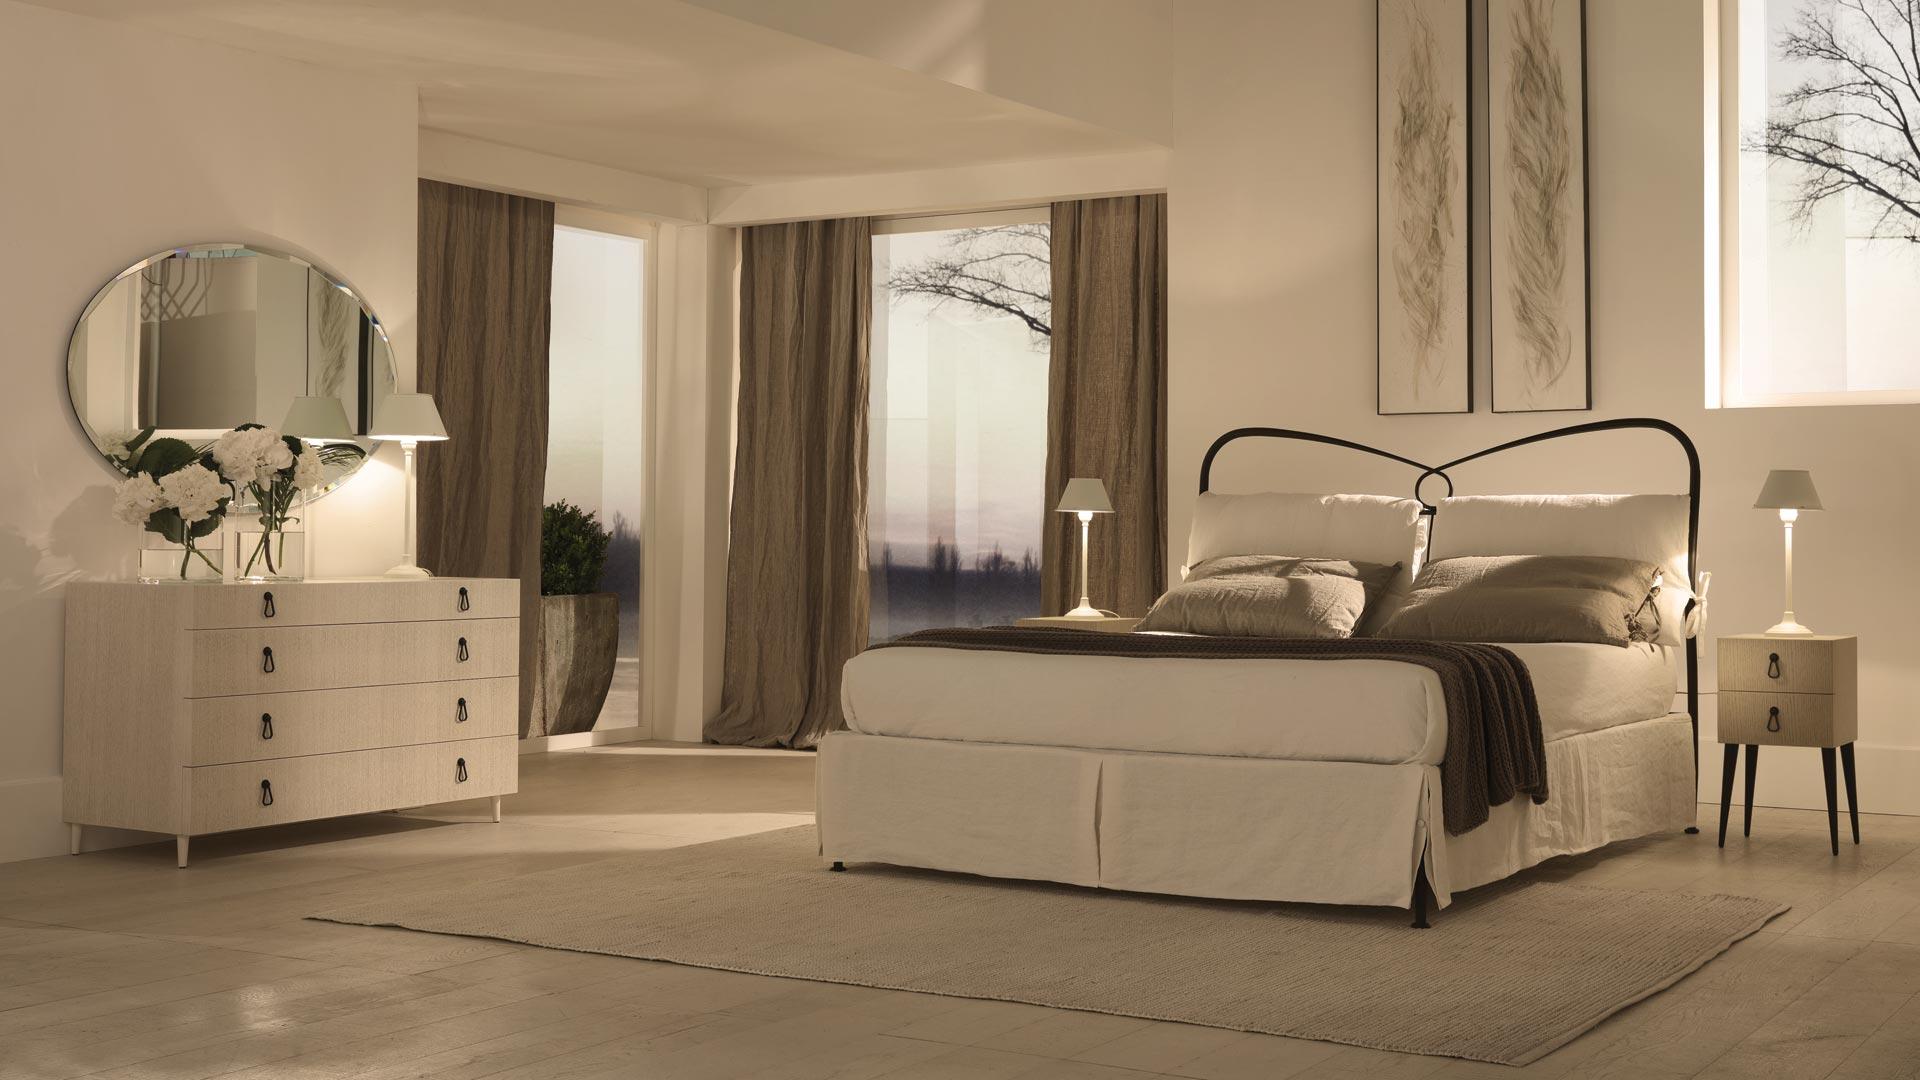 Awesome camera da letto cantori images house design for Mancini arredamenti